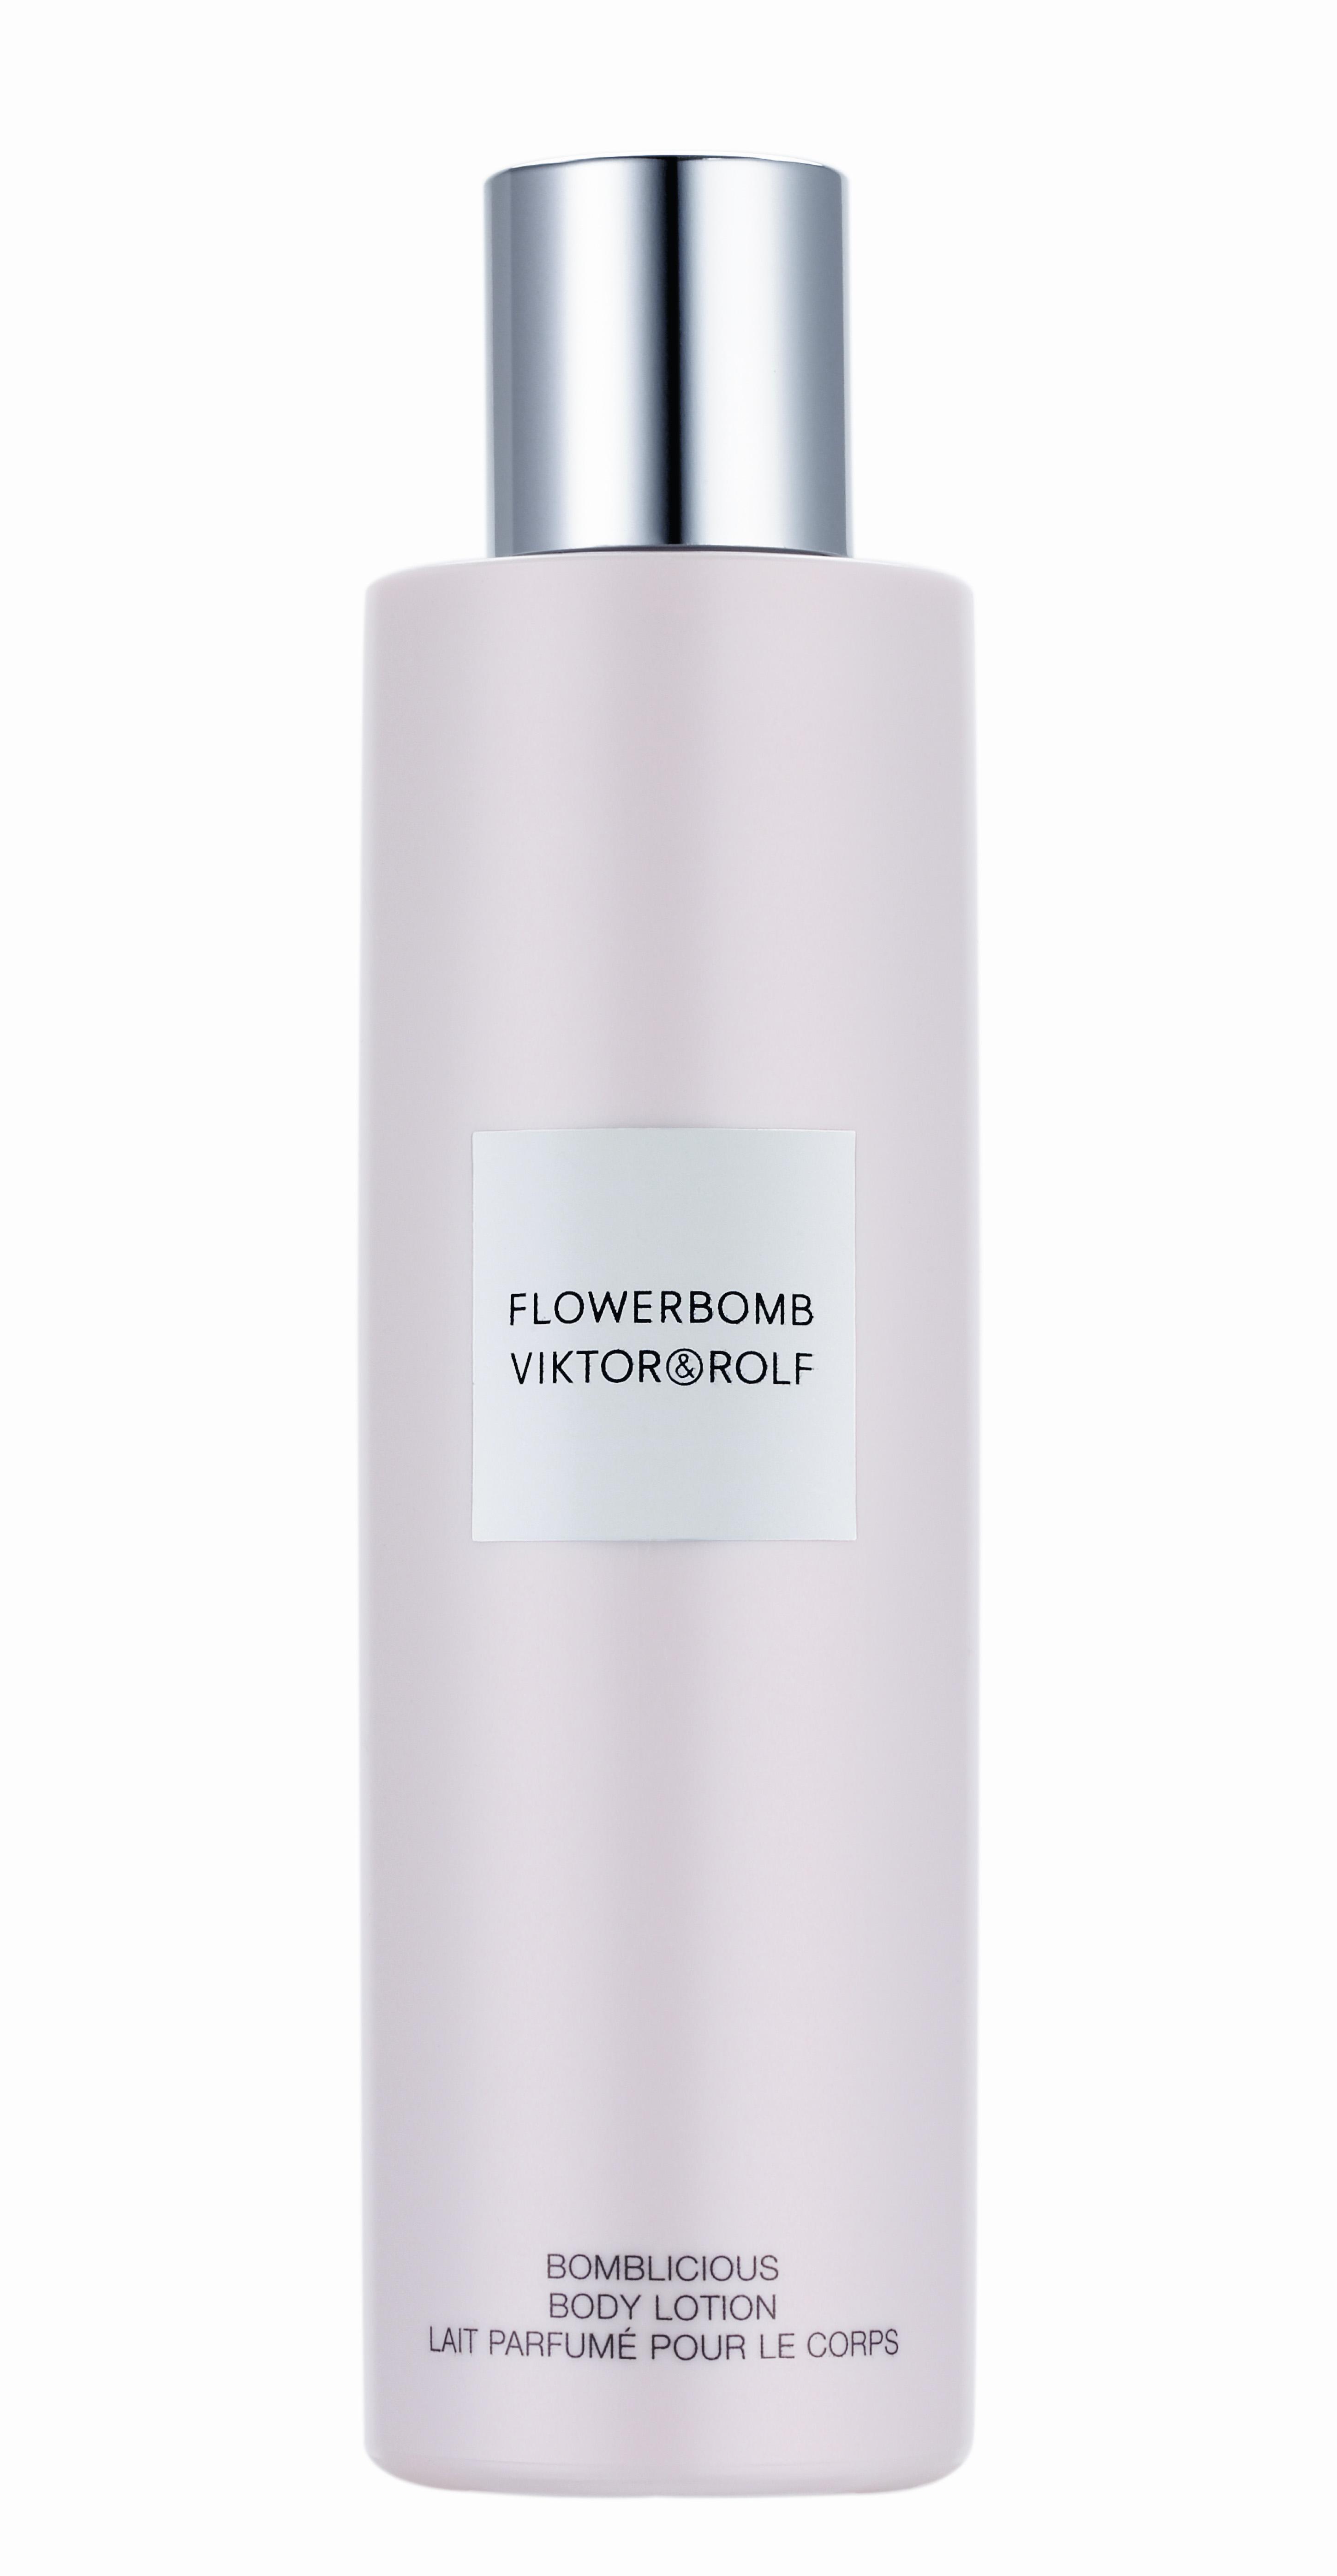 Viktor & Rolf Flowerbomb Bodylotion, 200 ml